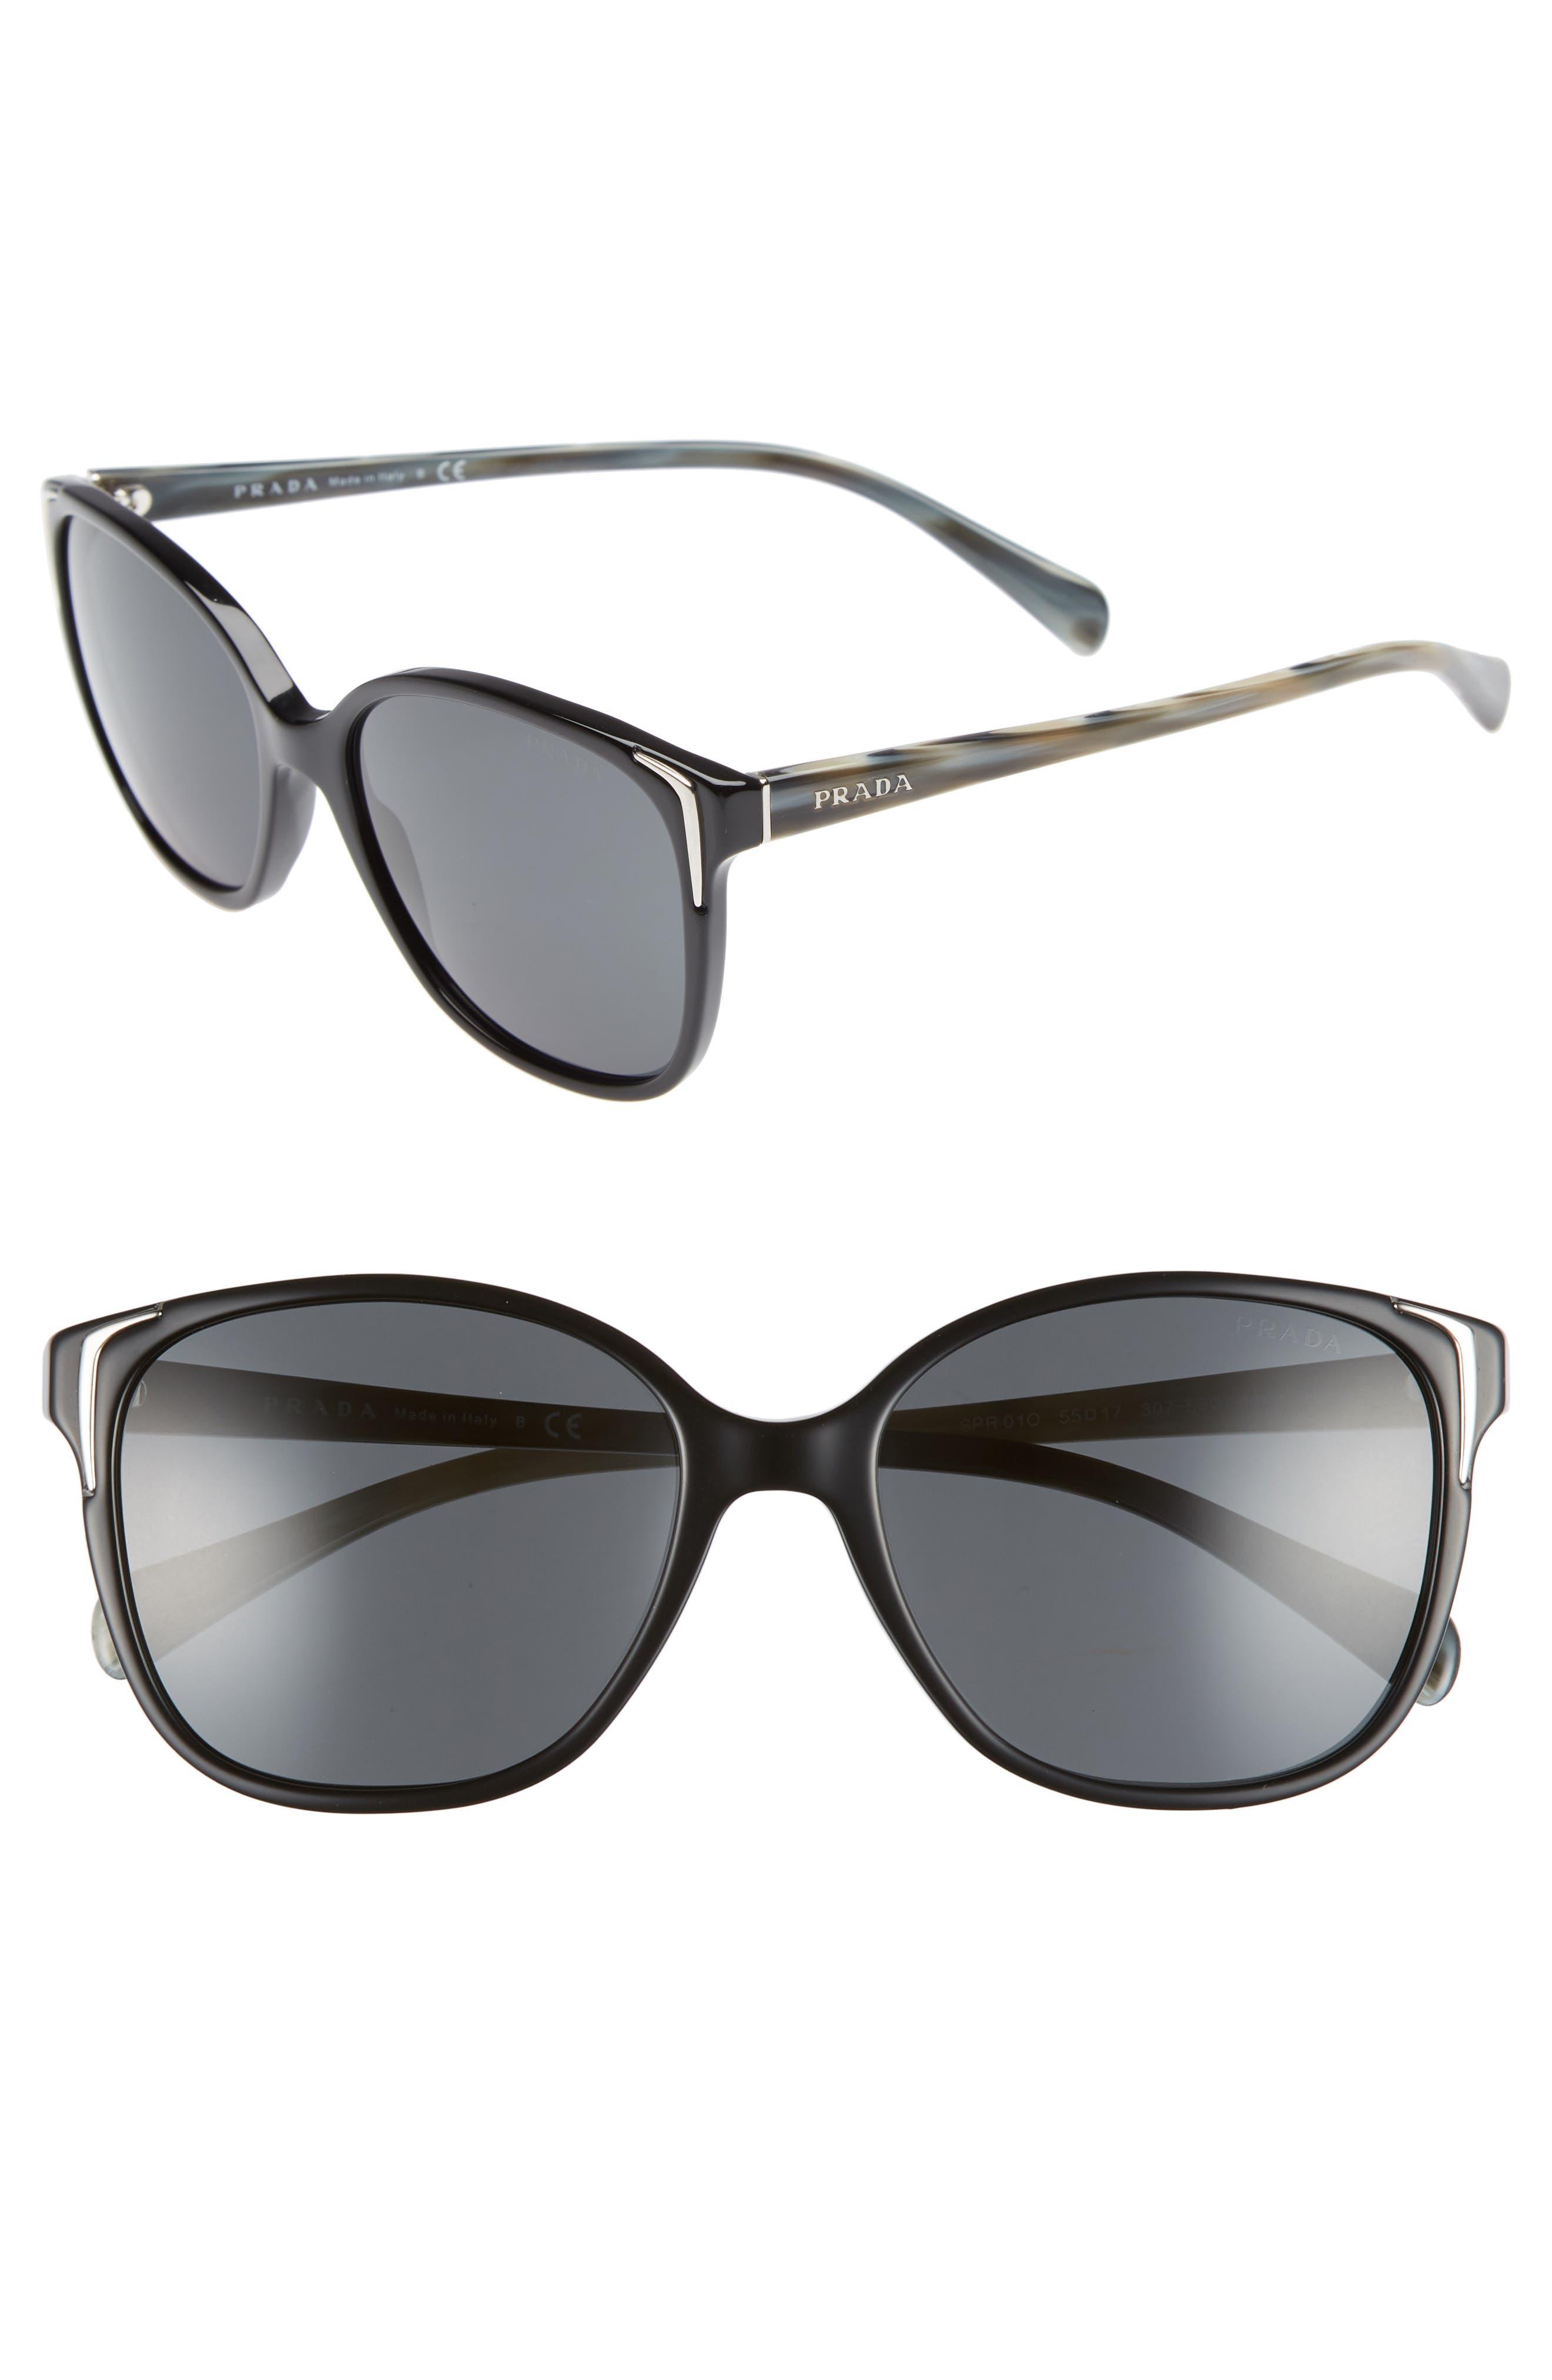 401ada3ce27fb prada sunglasses